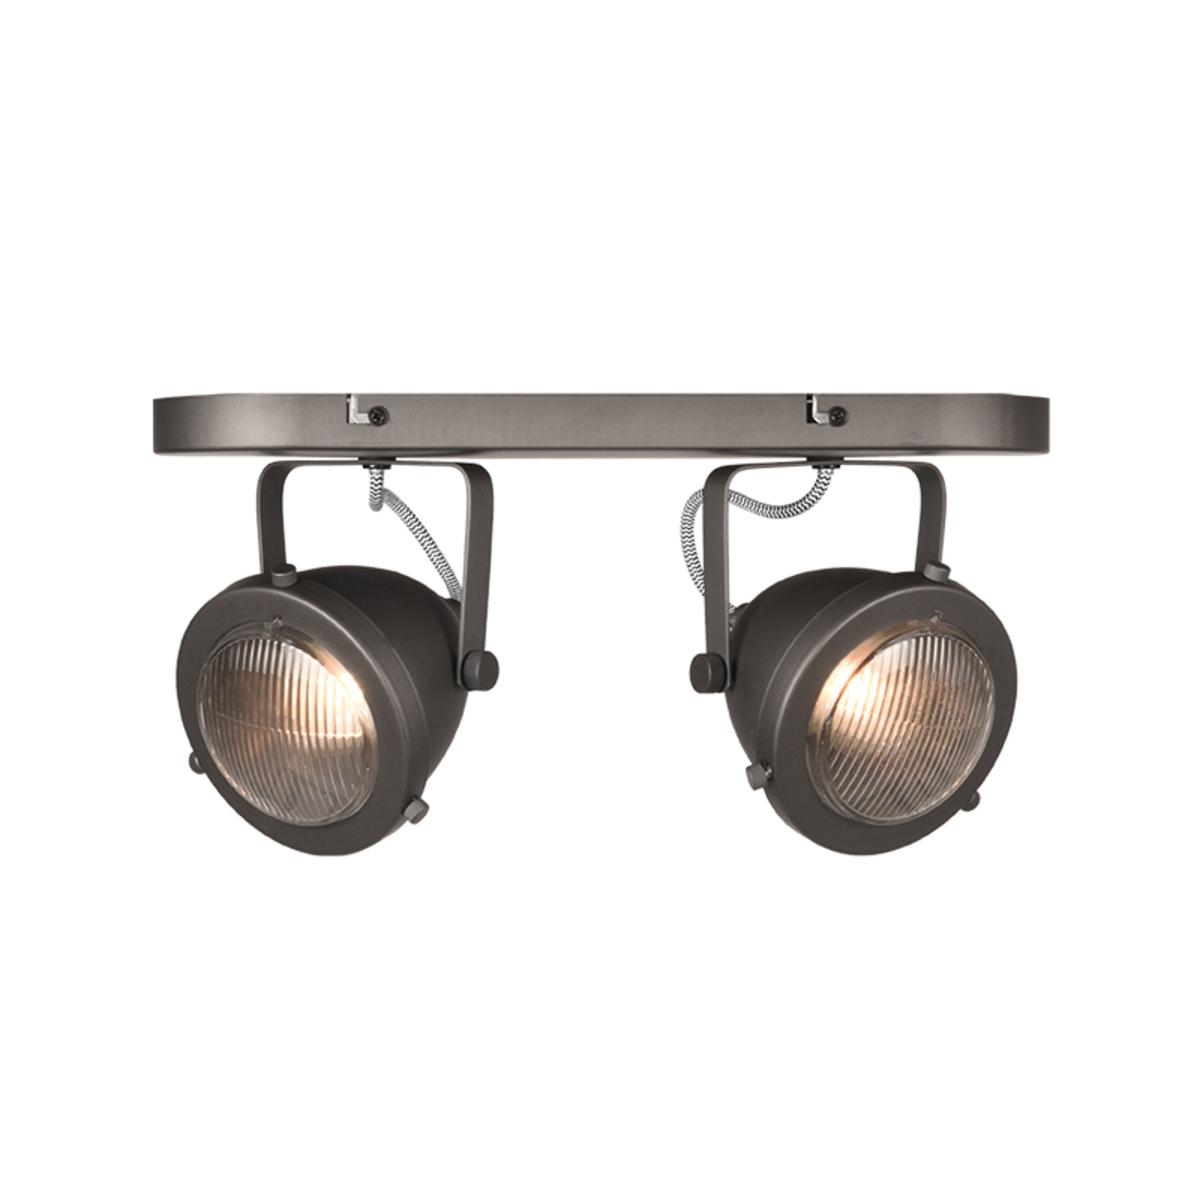 LABEL51 Spot Moto led - Burned Steel - Metaal - 2 Lichts